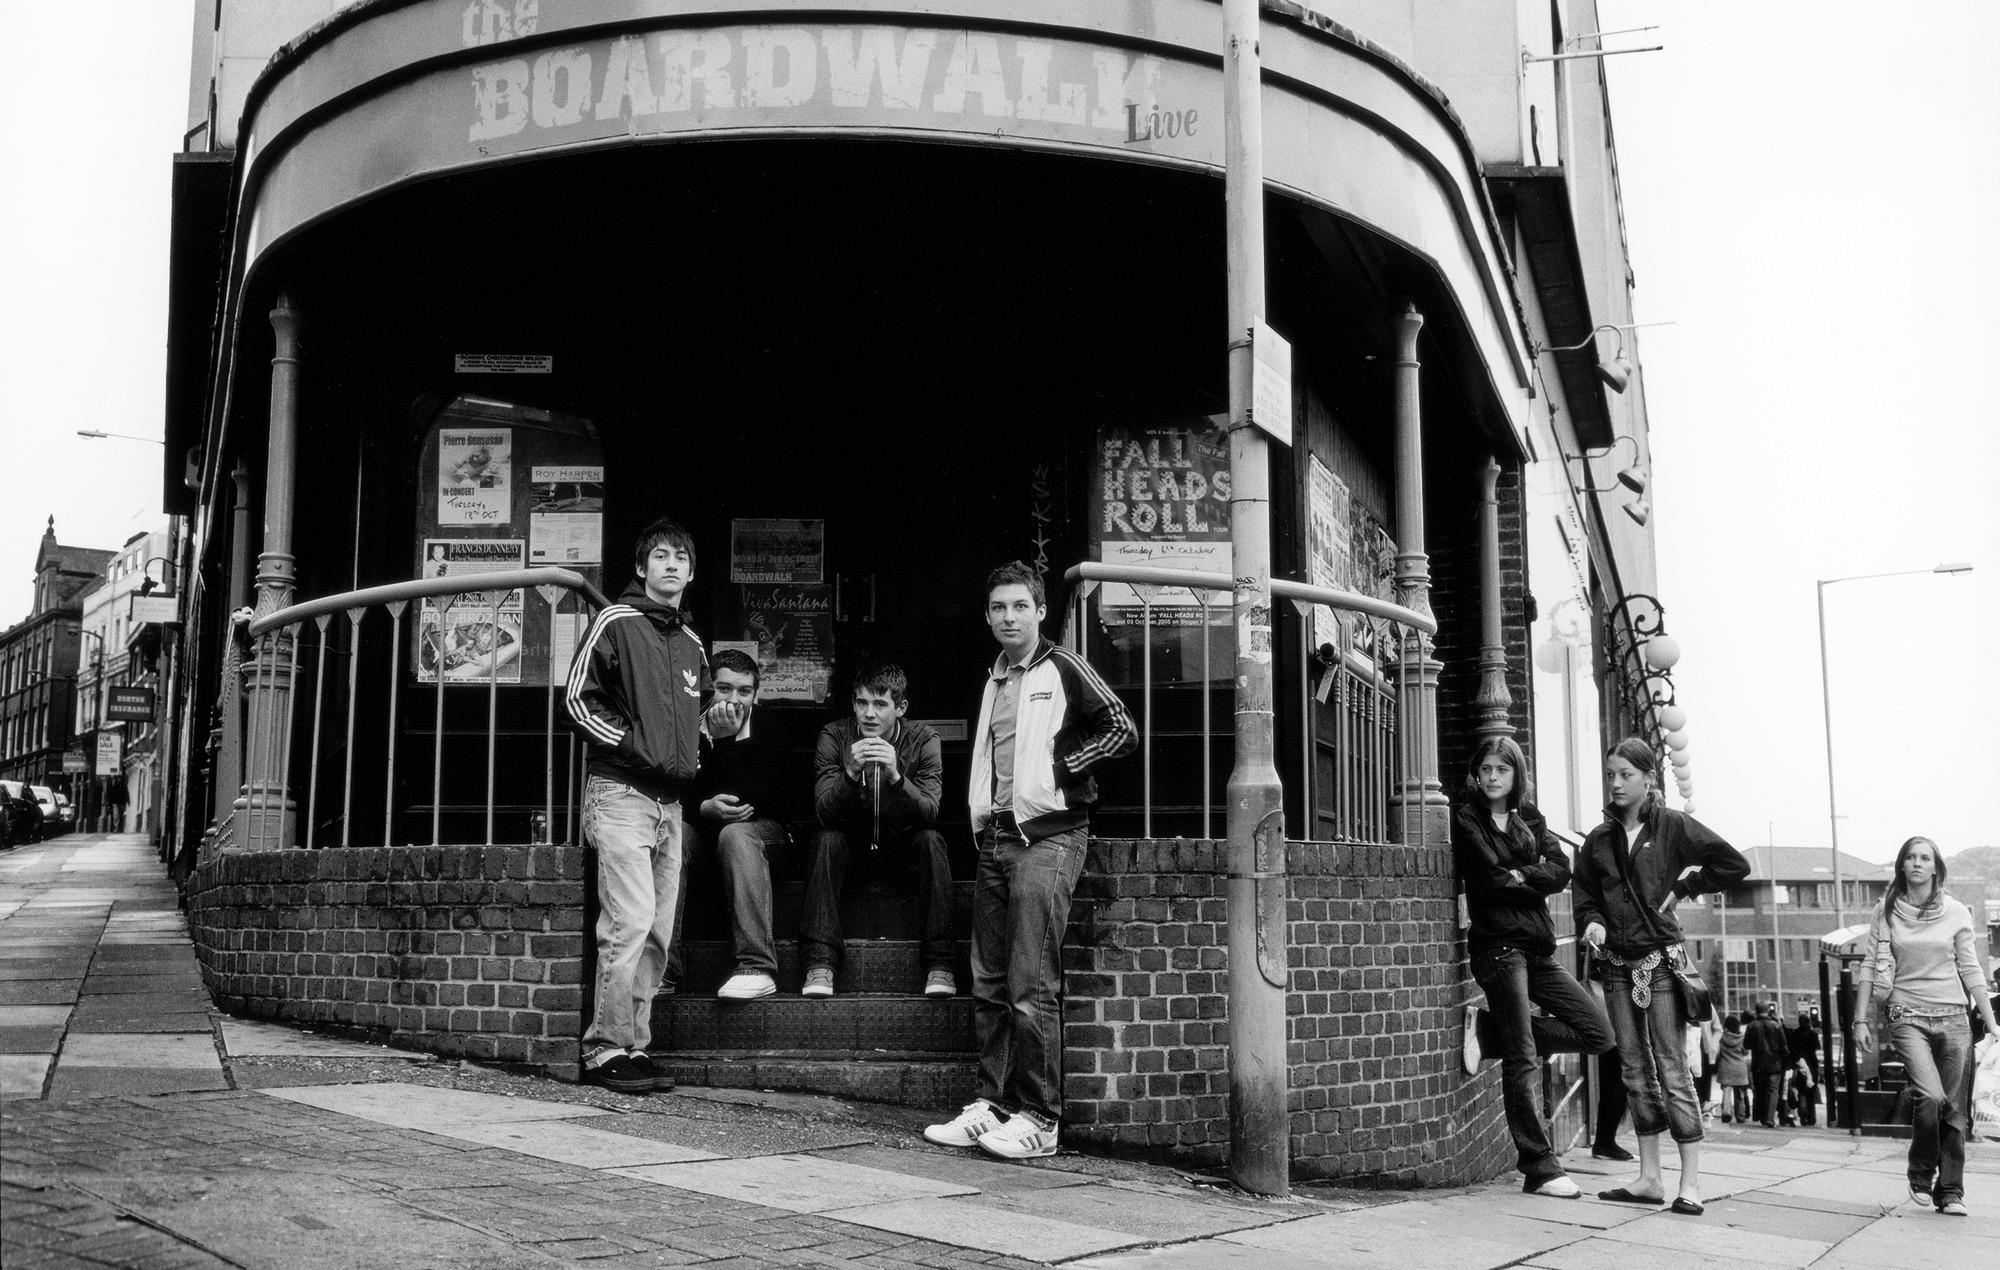 Arctic Monkeys at The Boardwalk